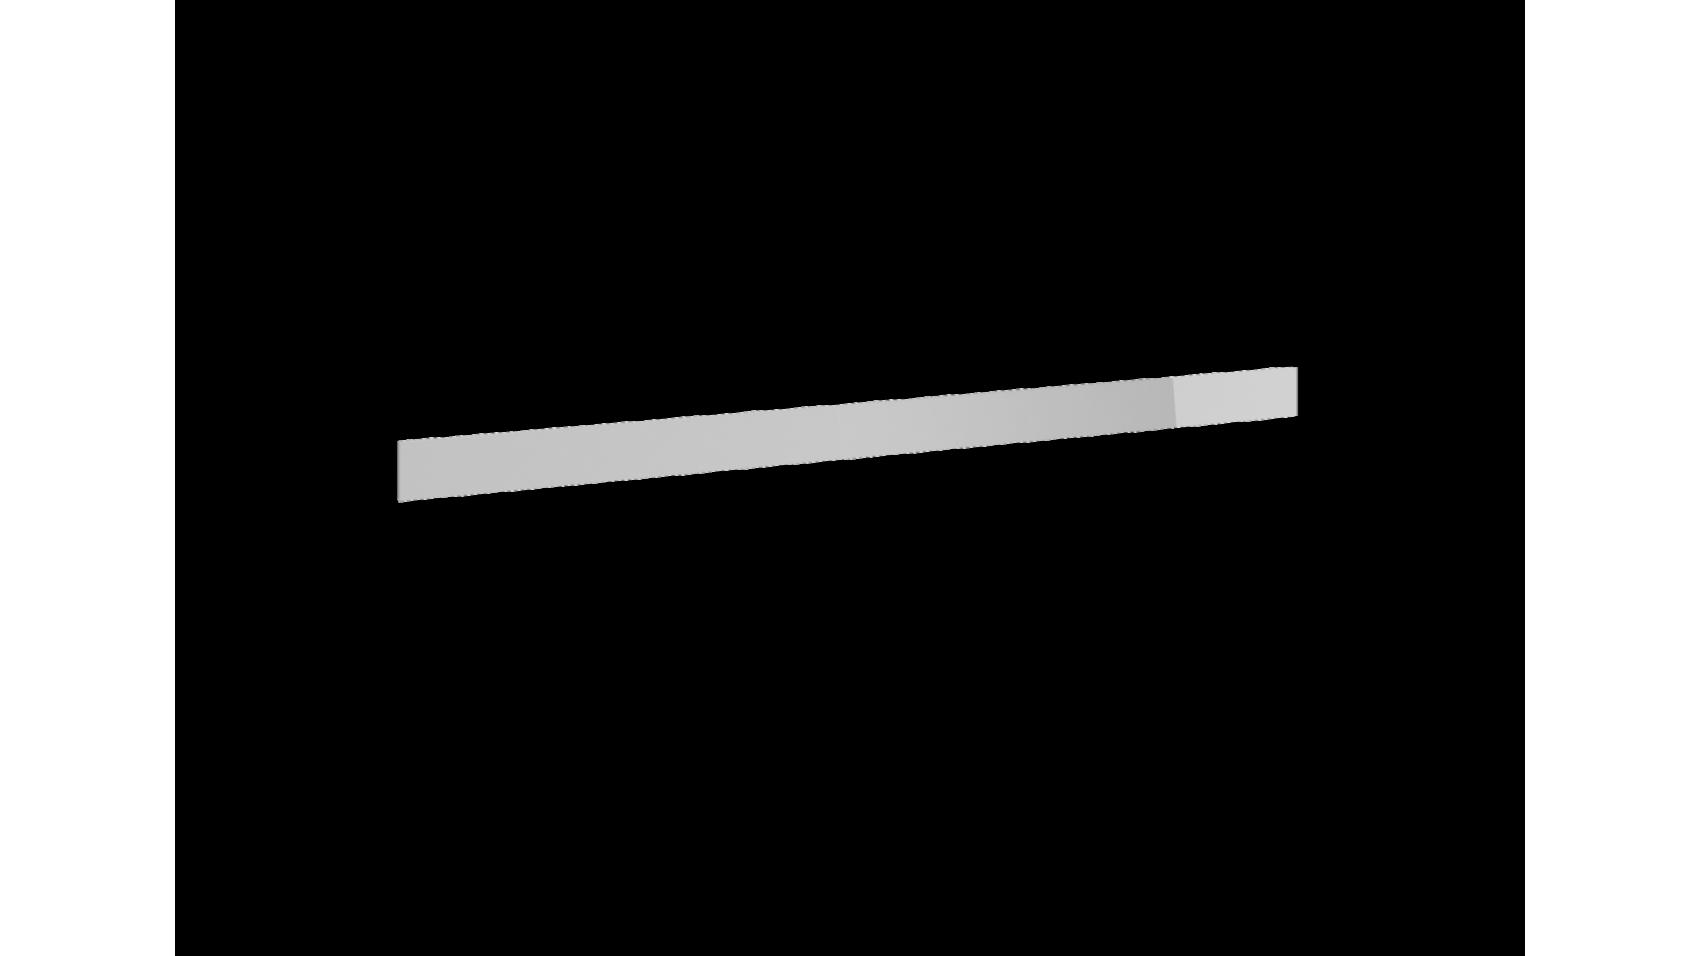 Kuchenne Elementy Dodatkowe Vegas Light Grey   sklep internetowy Lupus ECO